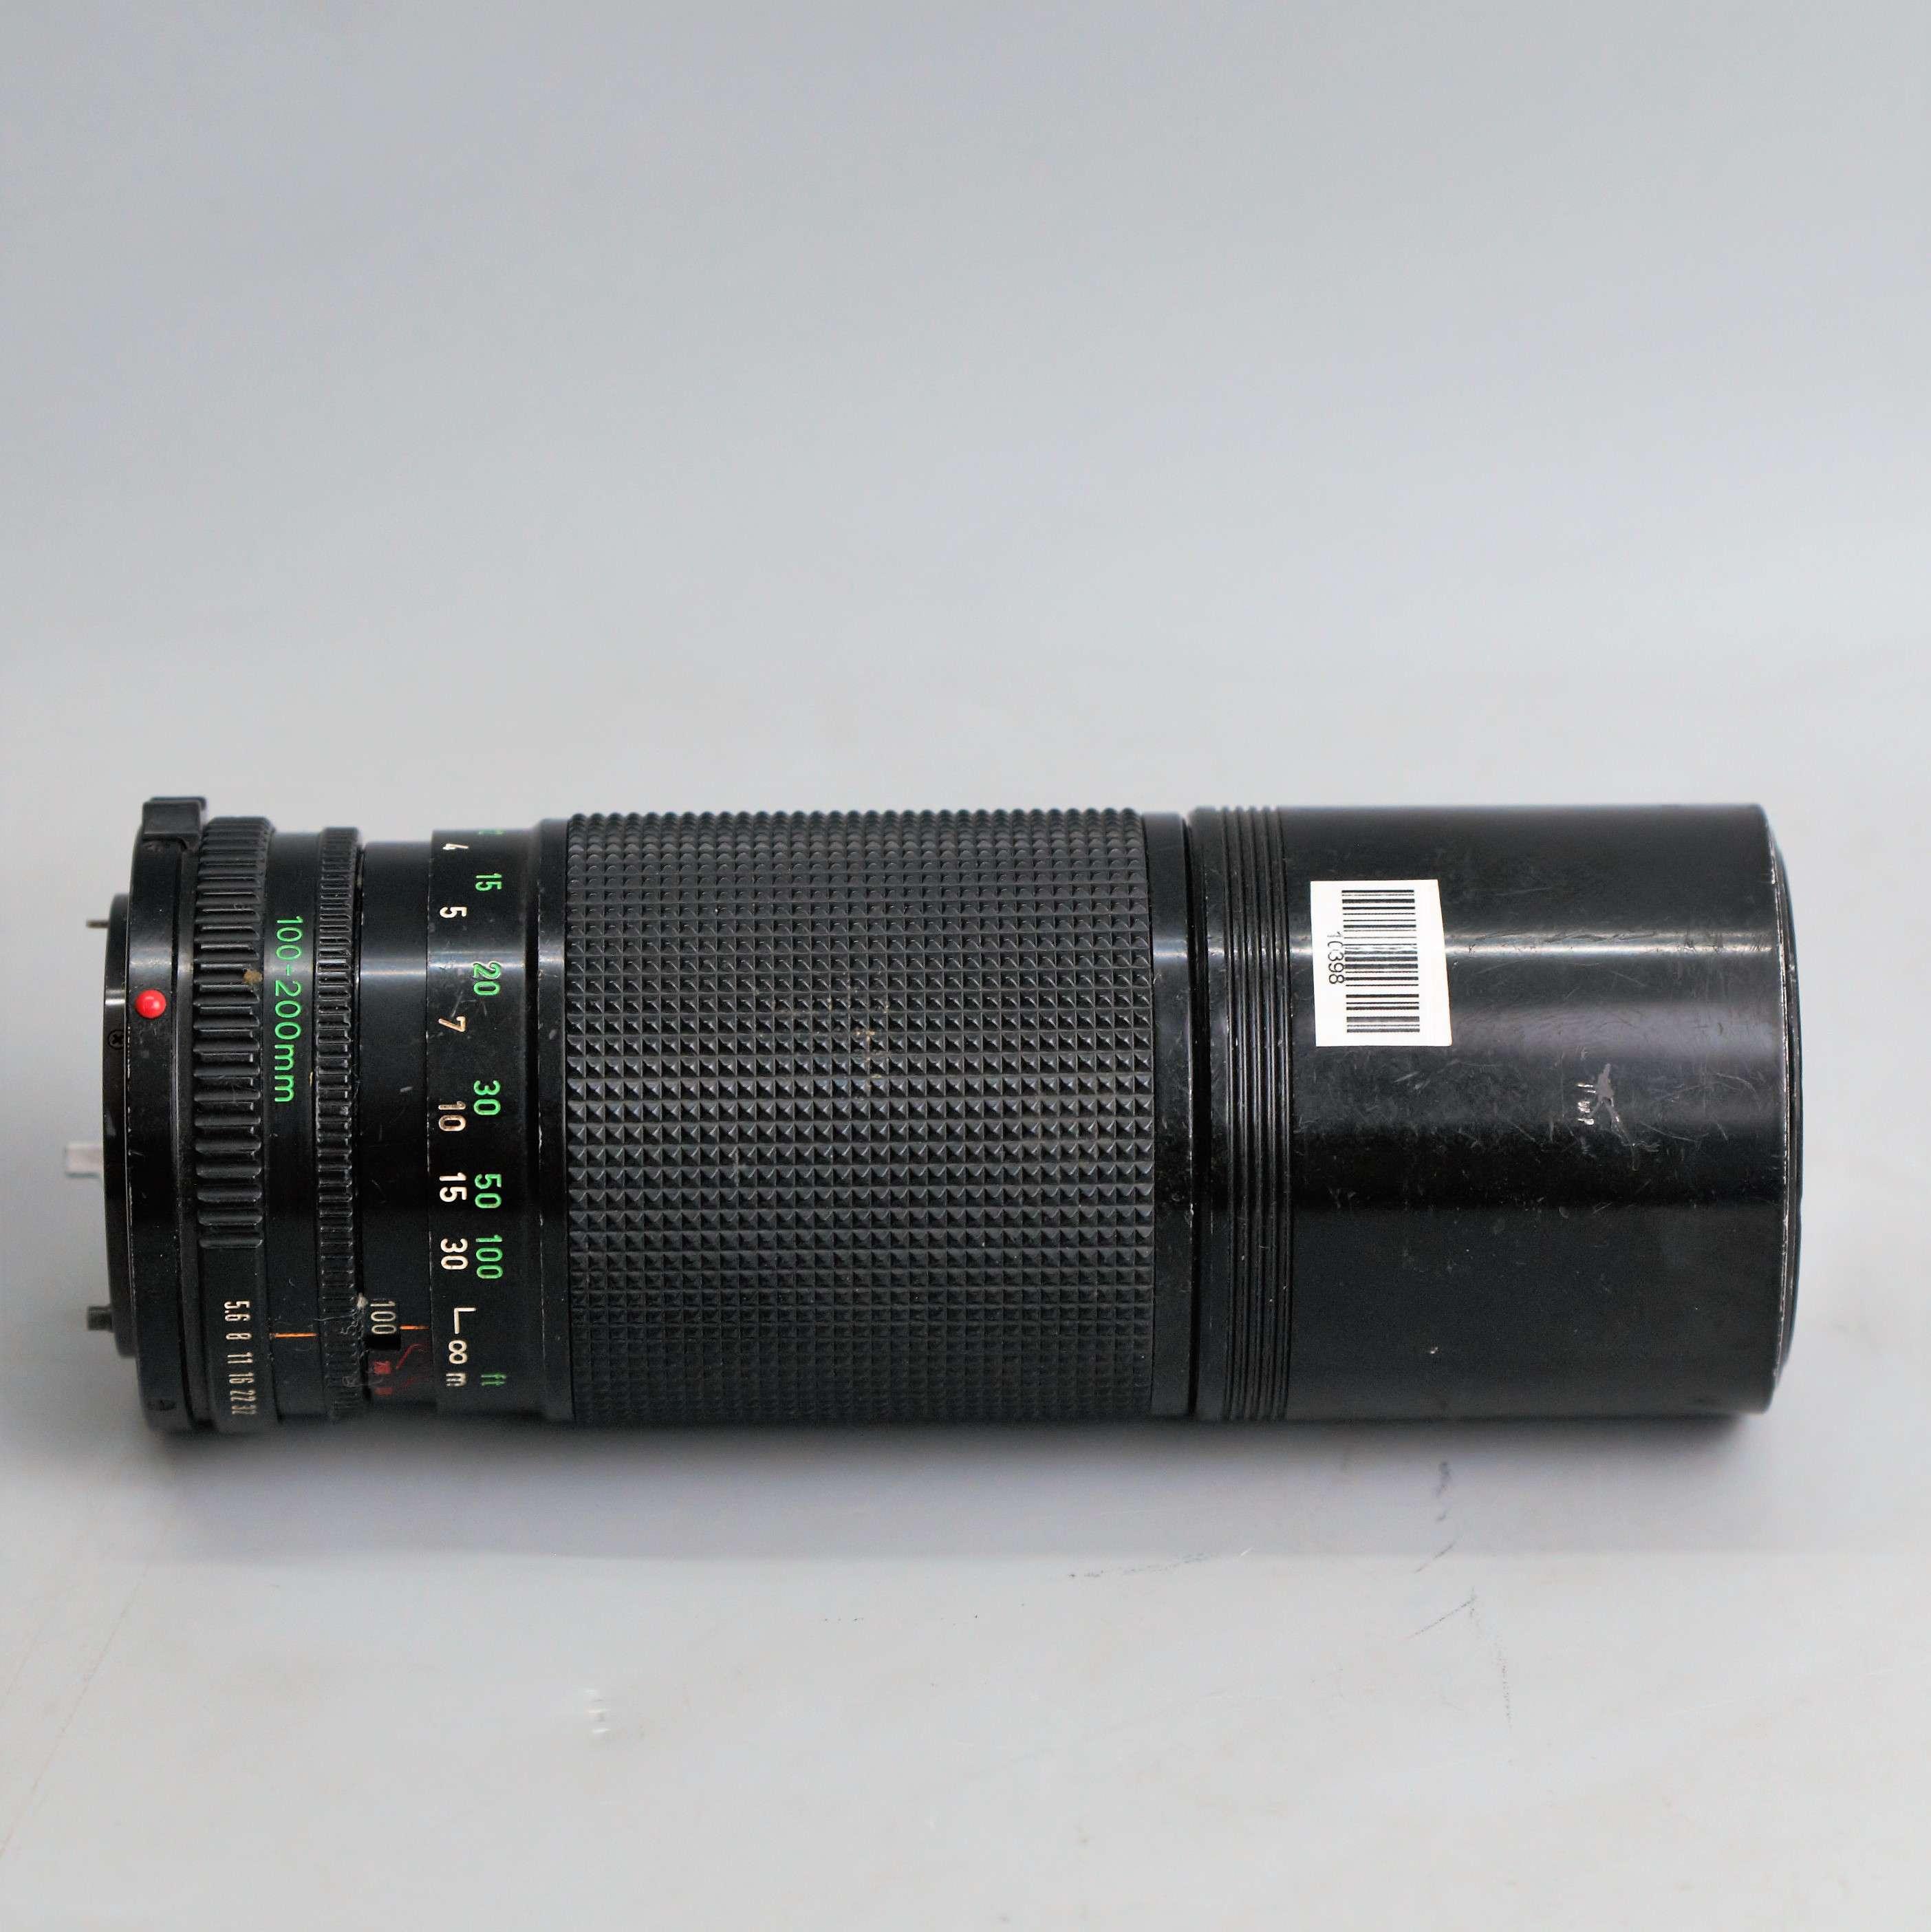 canon-fdn-100-200mm-f5-6-mf-canon-100-200-5-6-10398